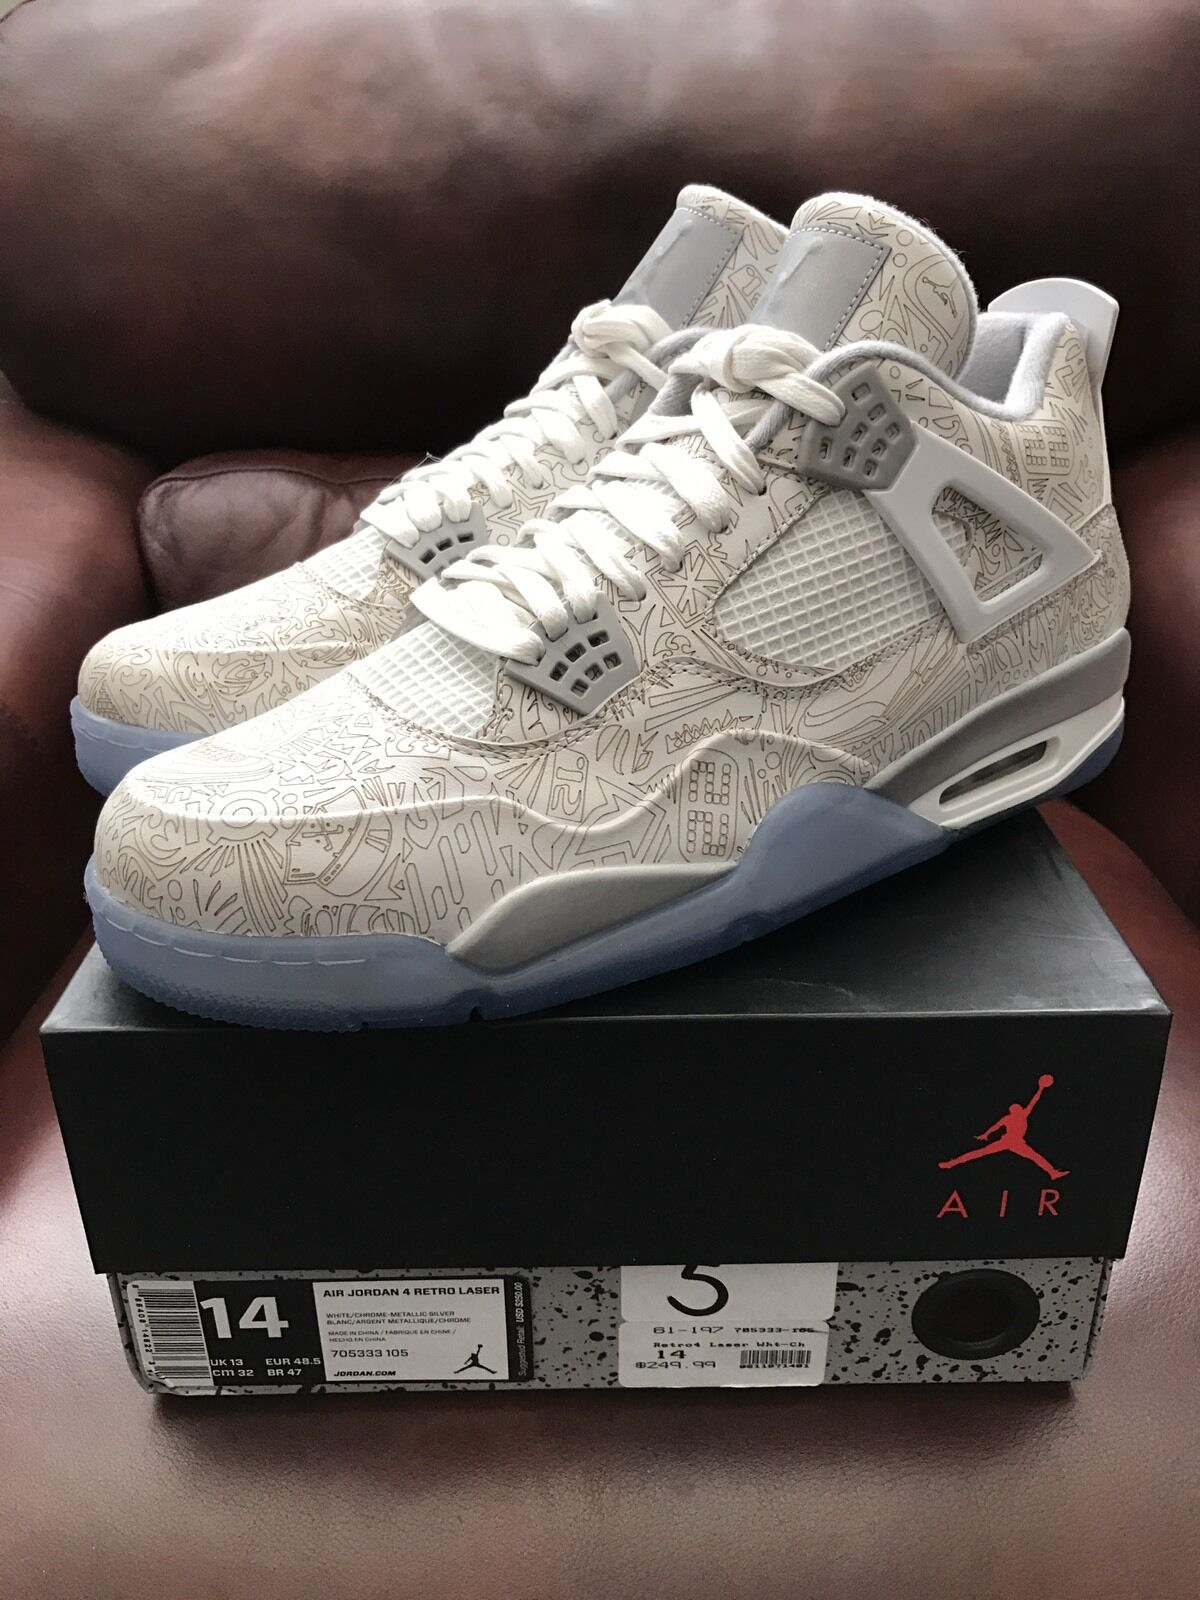 Nike Air Jordan 4 Retro Laser White/Chrome-Blue 705333-105 New/DS Sz. 14